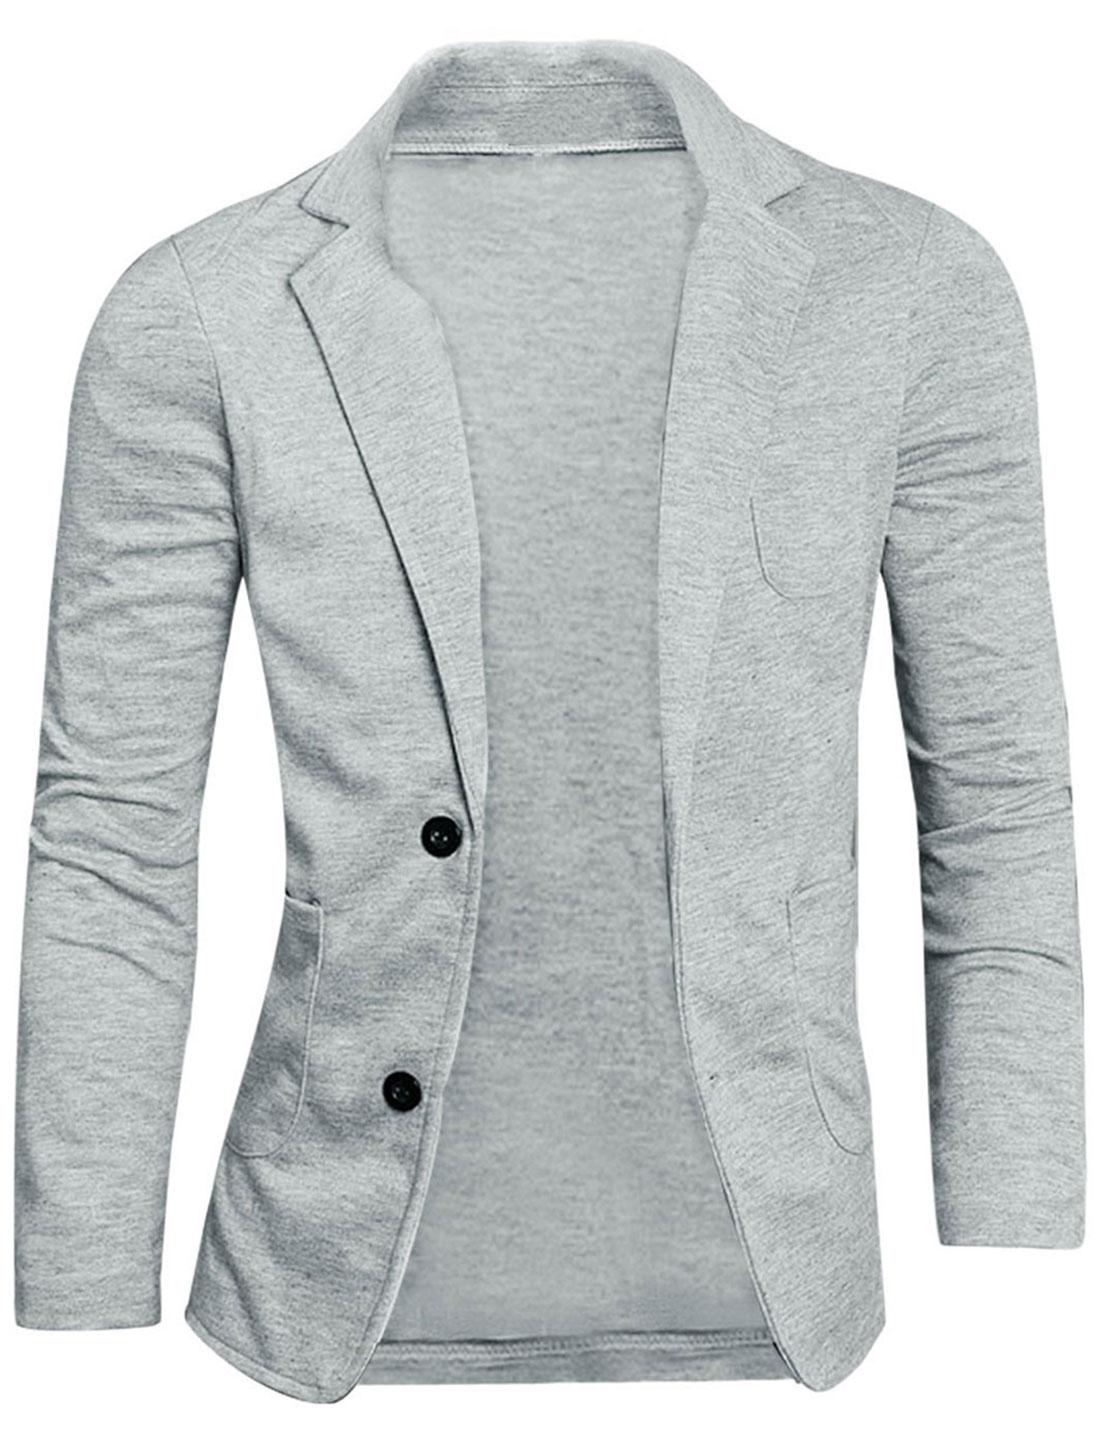 Men Classic Notched Lapel Two-Button Blazer Gray L